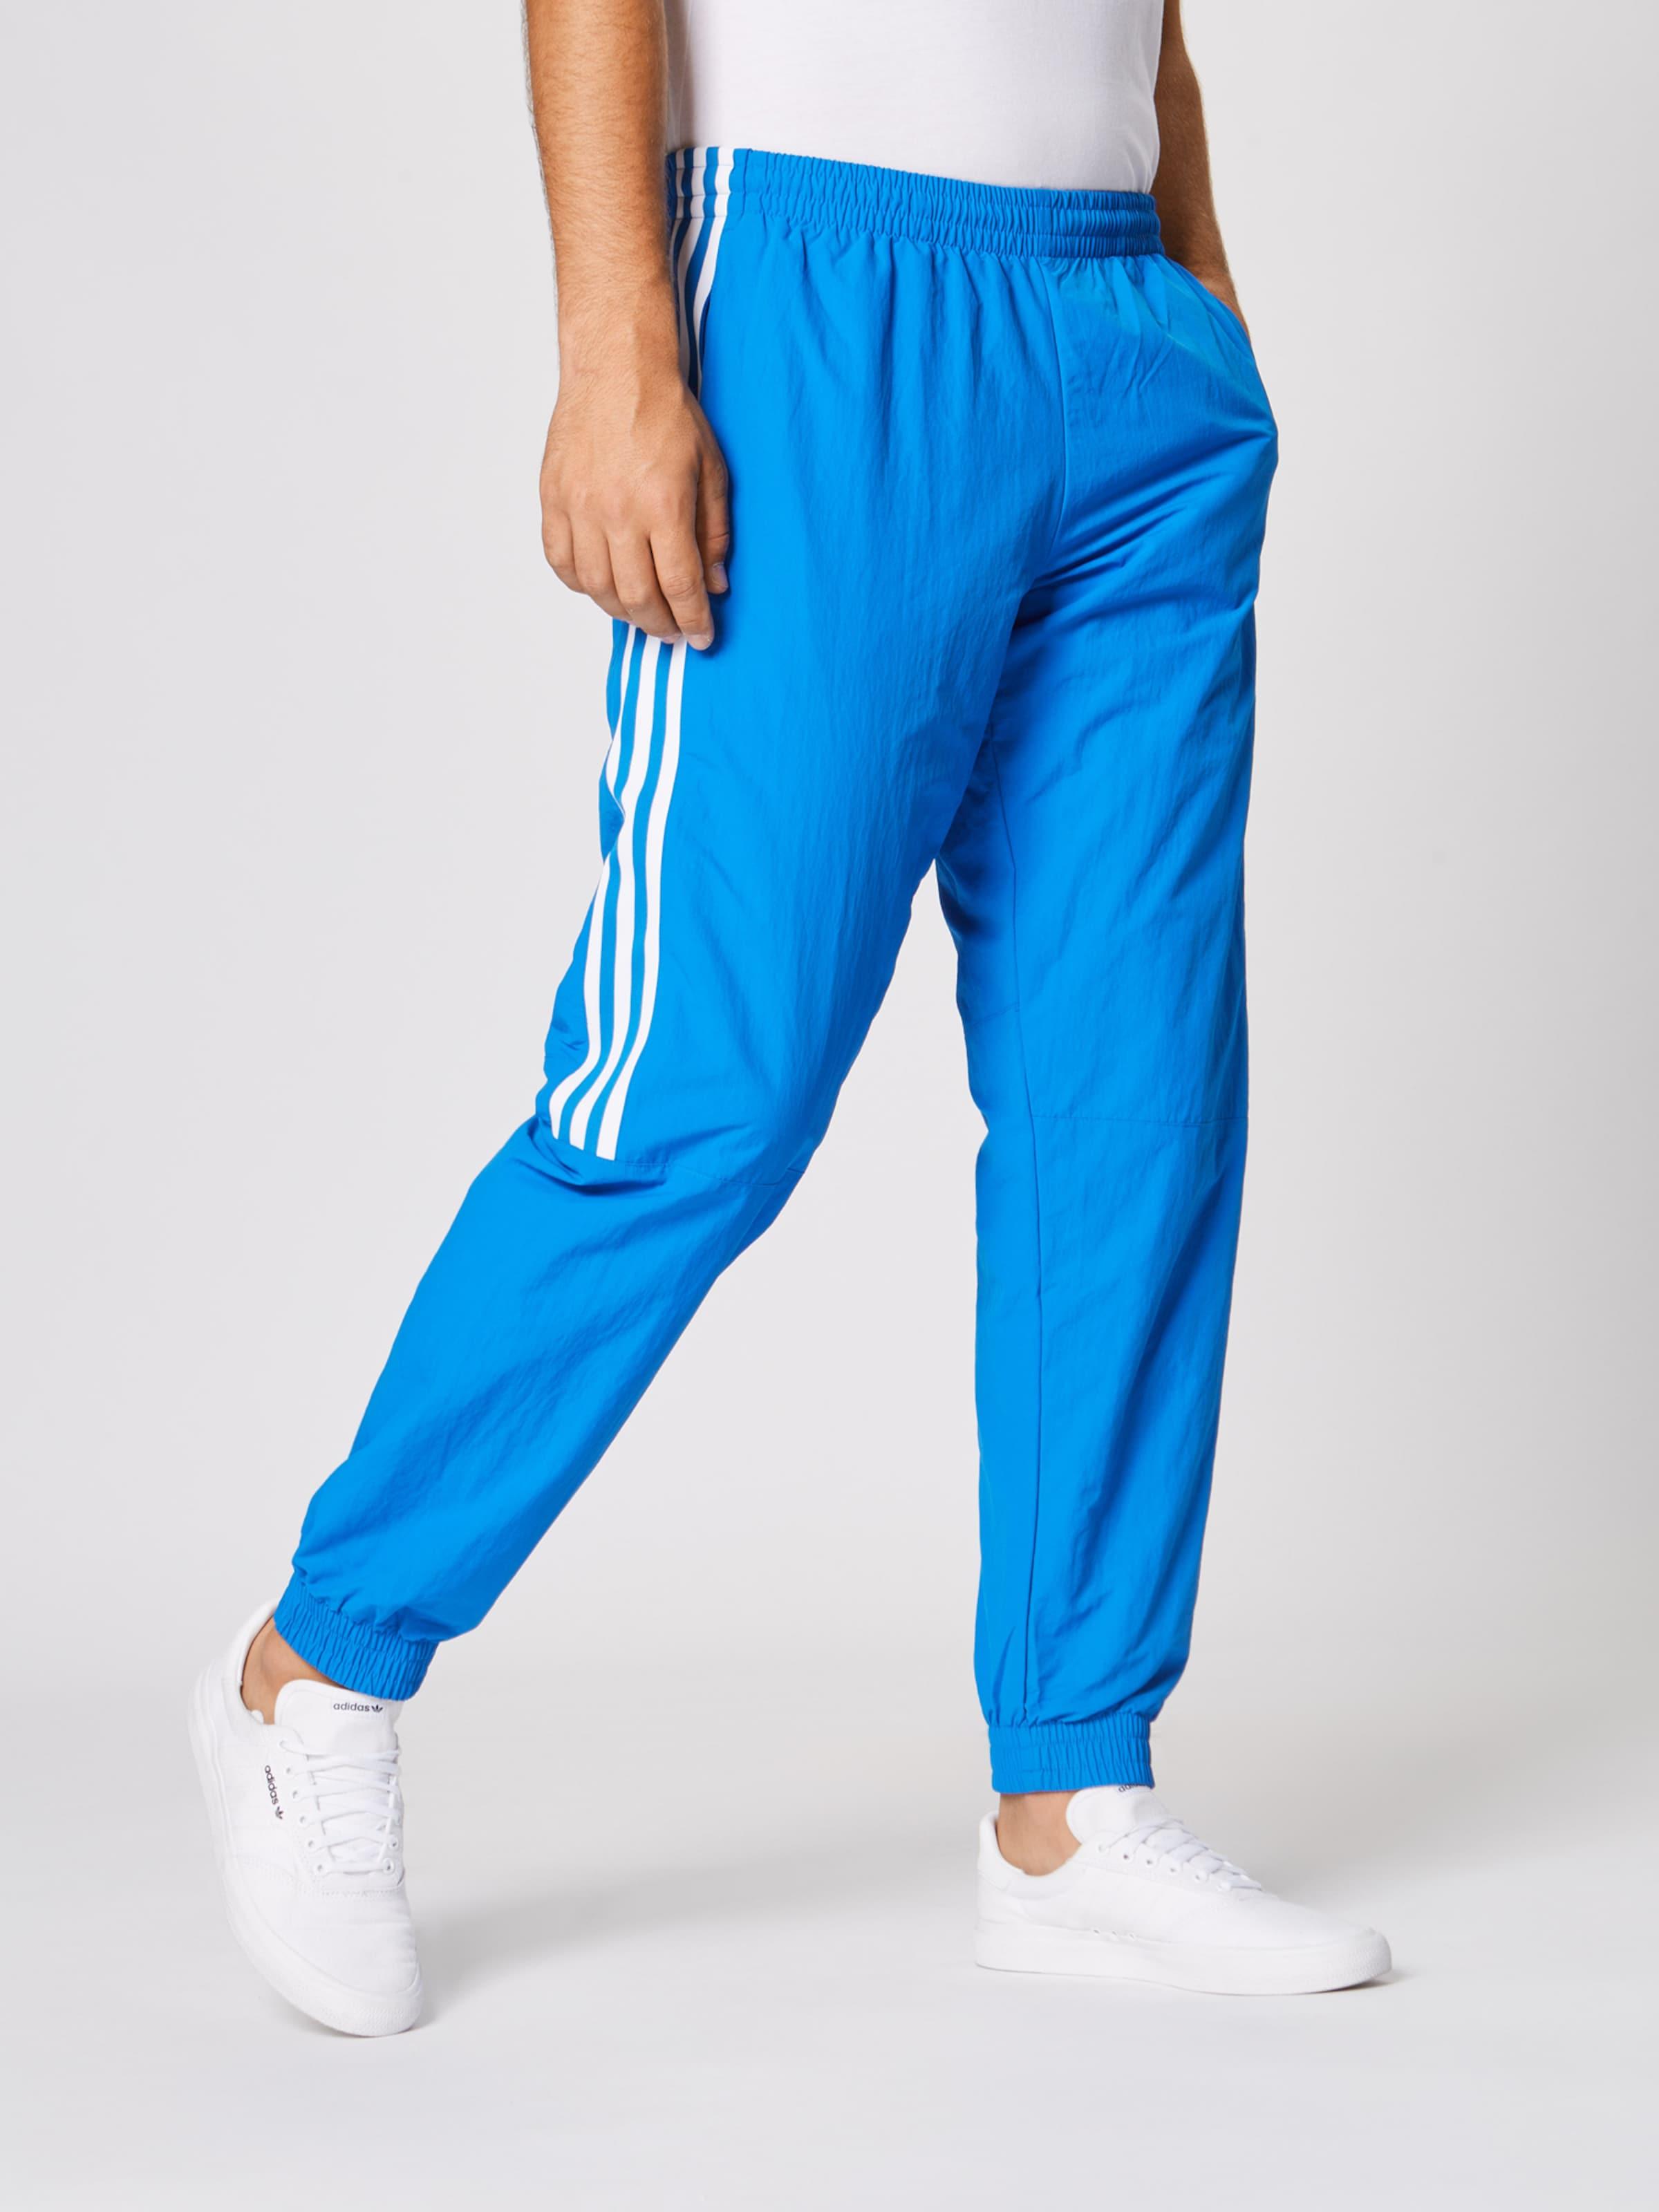 Tp' Blau Up Adidas In Originals Hosen 'lock 35A4RjL